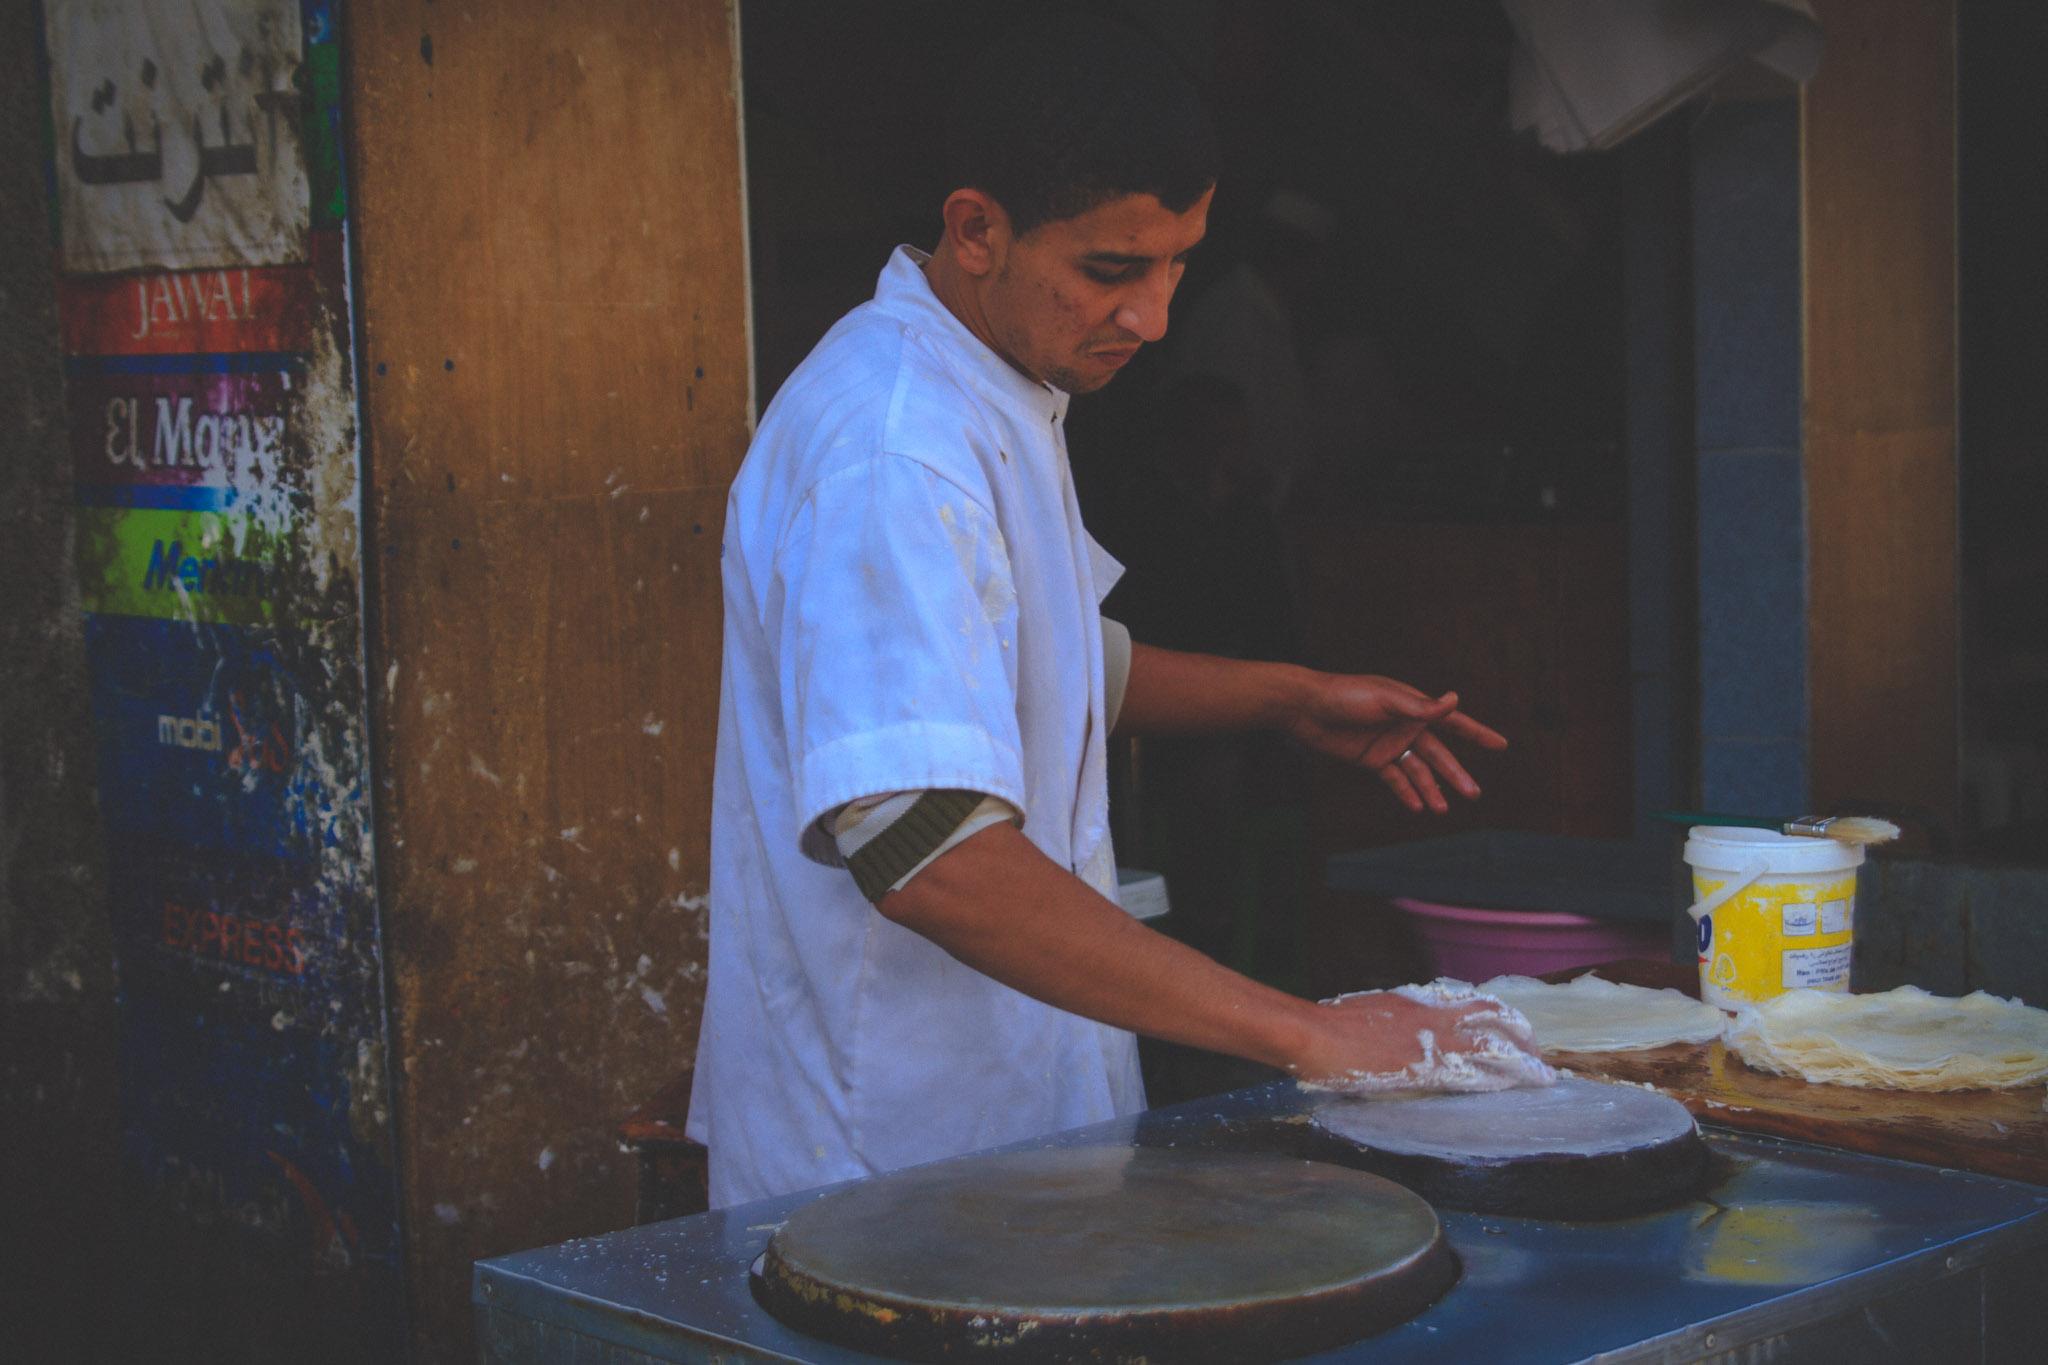 morocco_rabat_fez_casablanca_lesleyade_photography-7.jpg